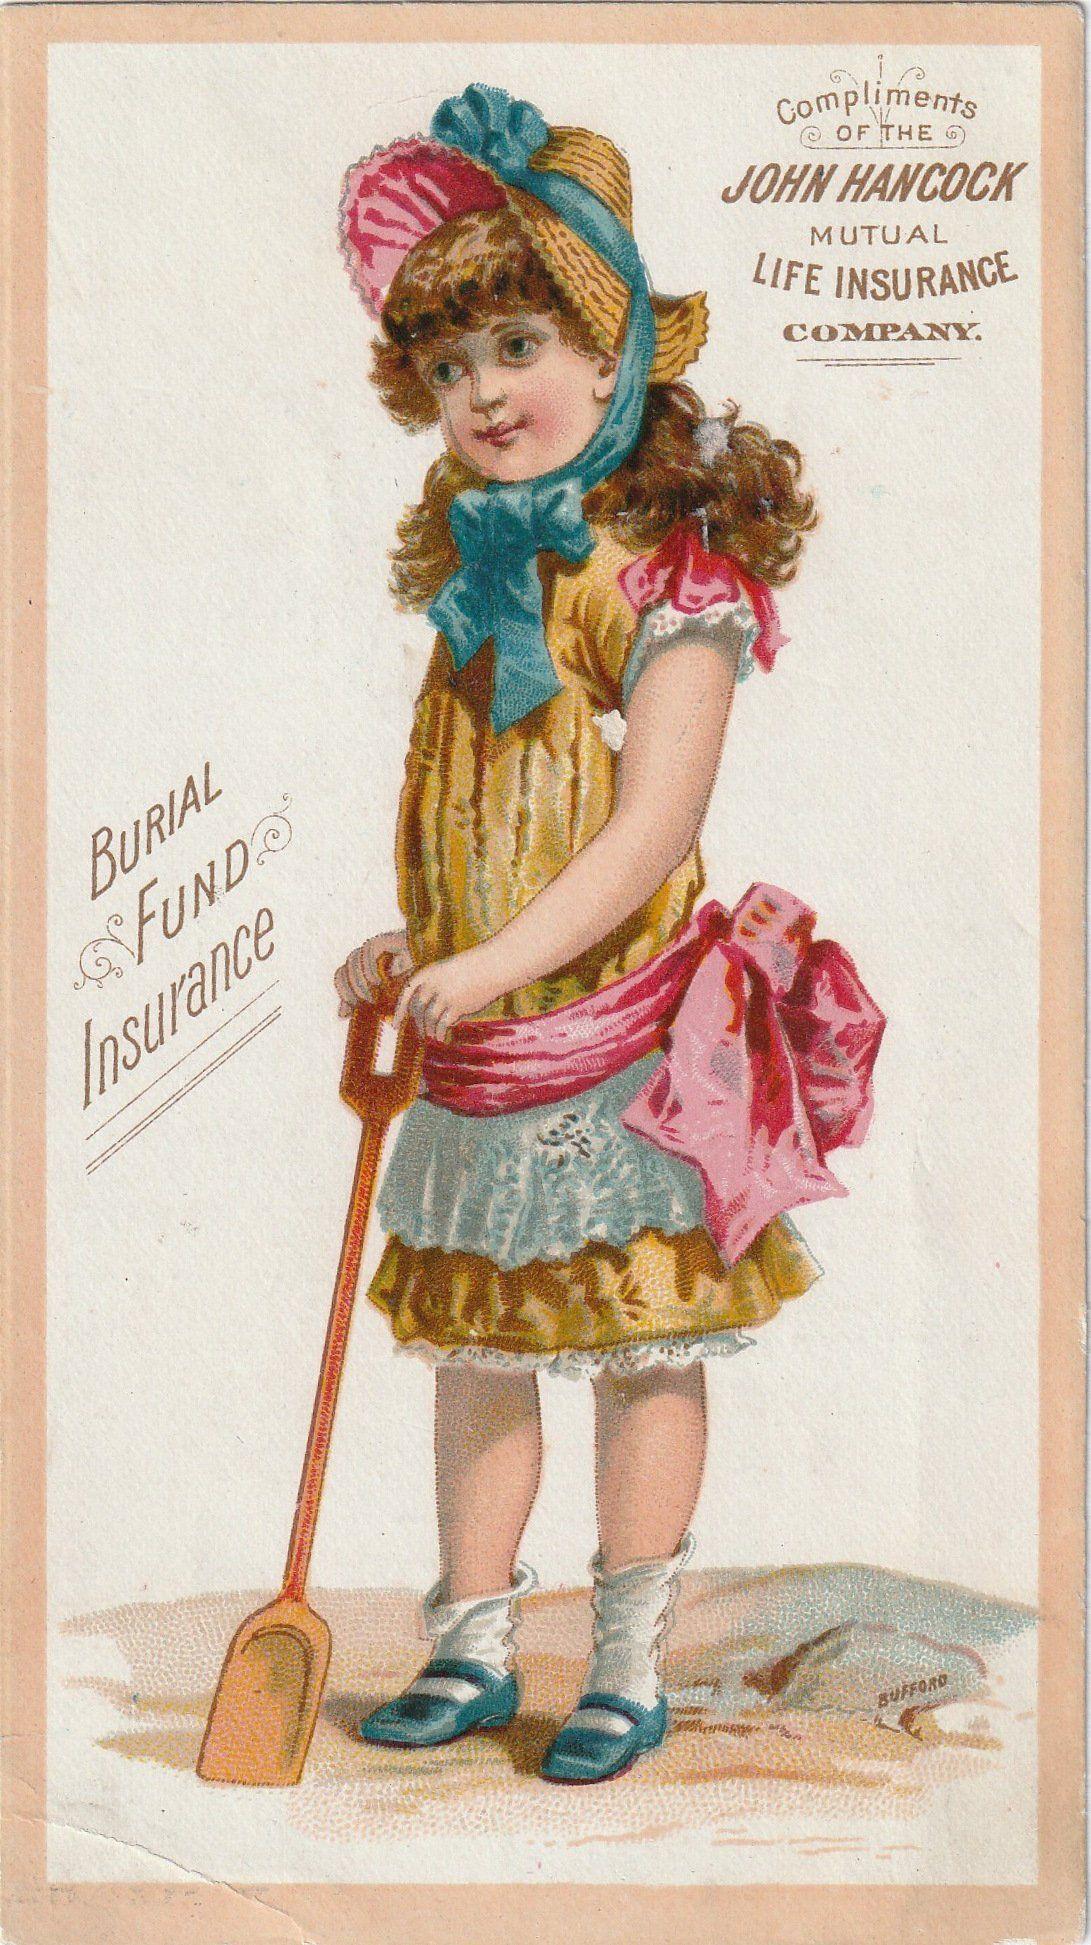 Burial fund insurance trade card c 1800s ephemera